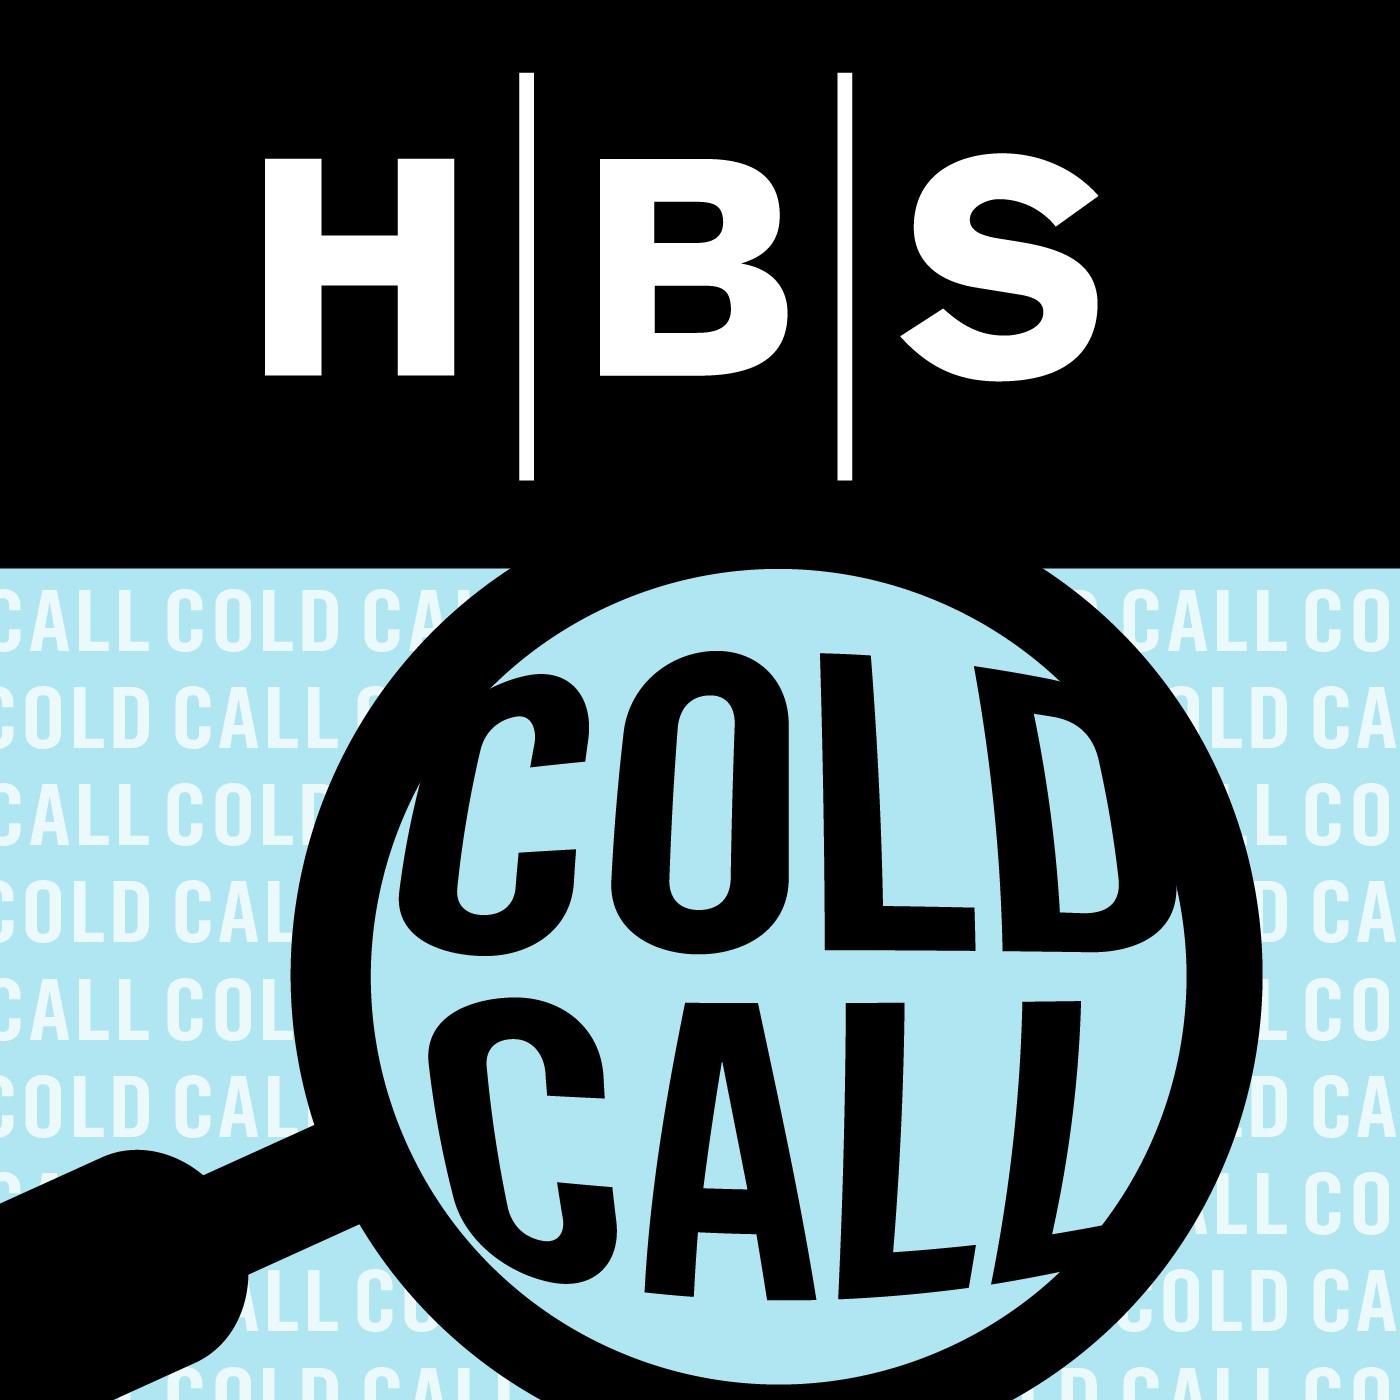 Artwork for Cold Calling Stella McCartney